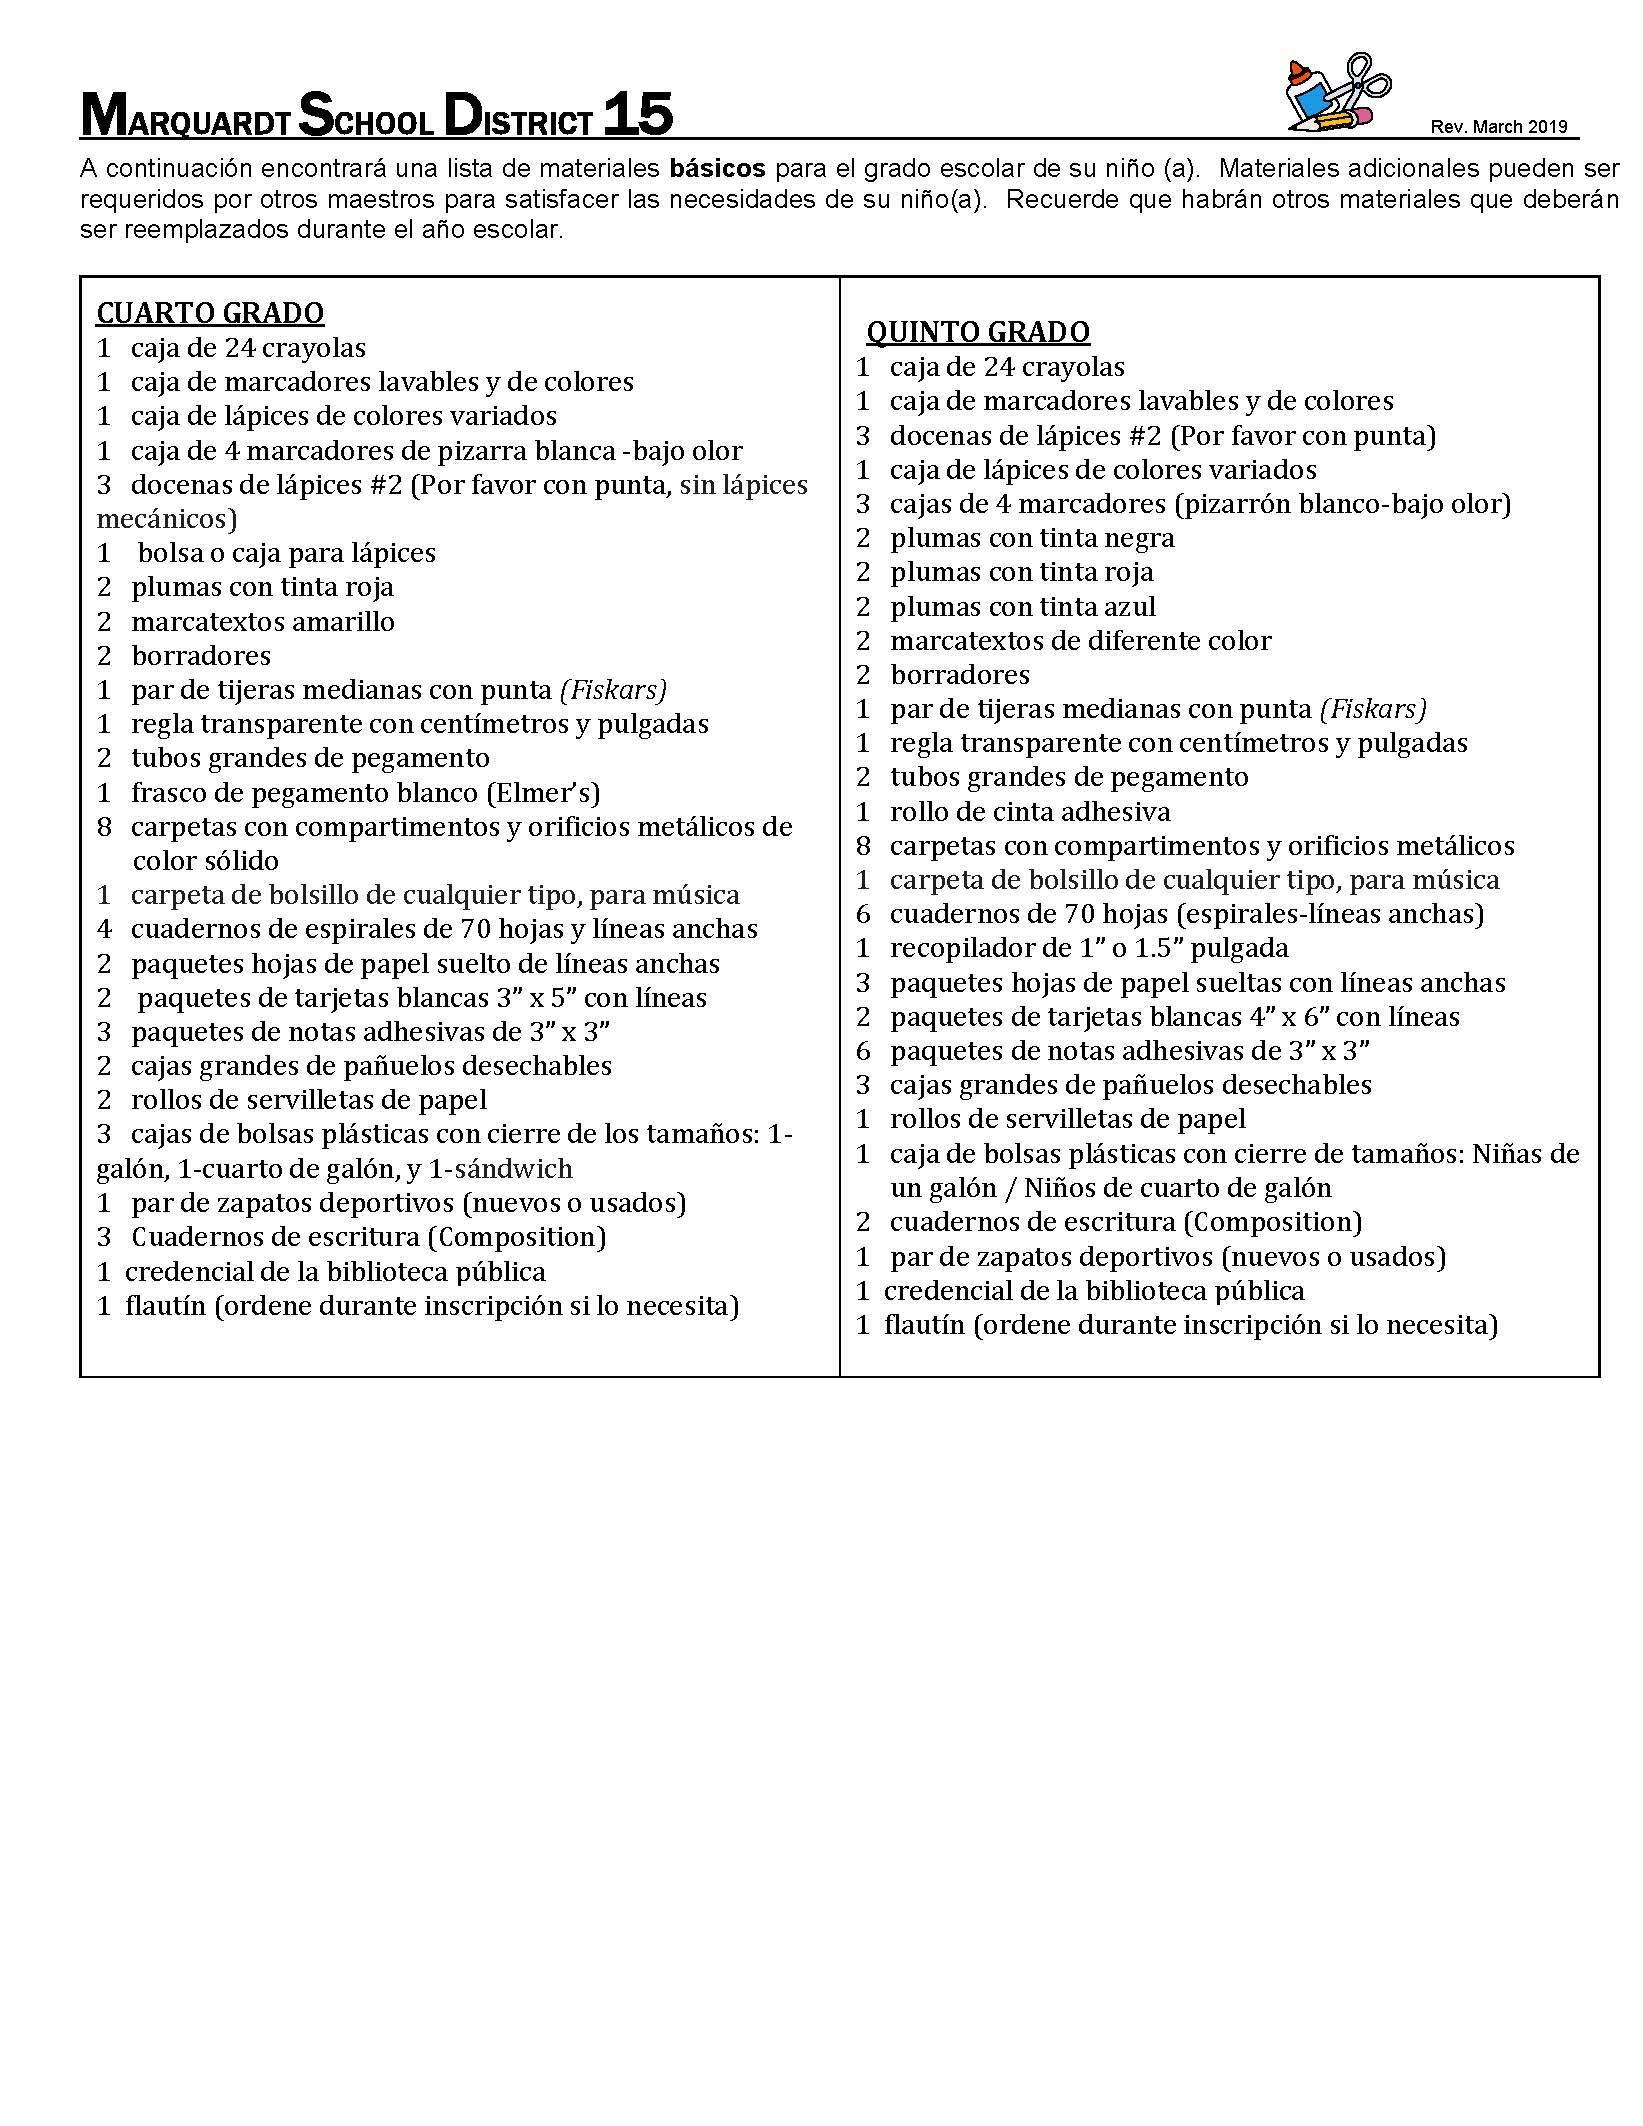 Supplies_K-5_1920%2BSpanish_Page_2.jpg